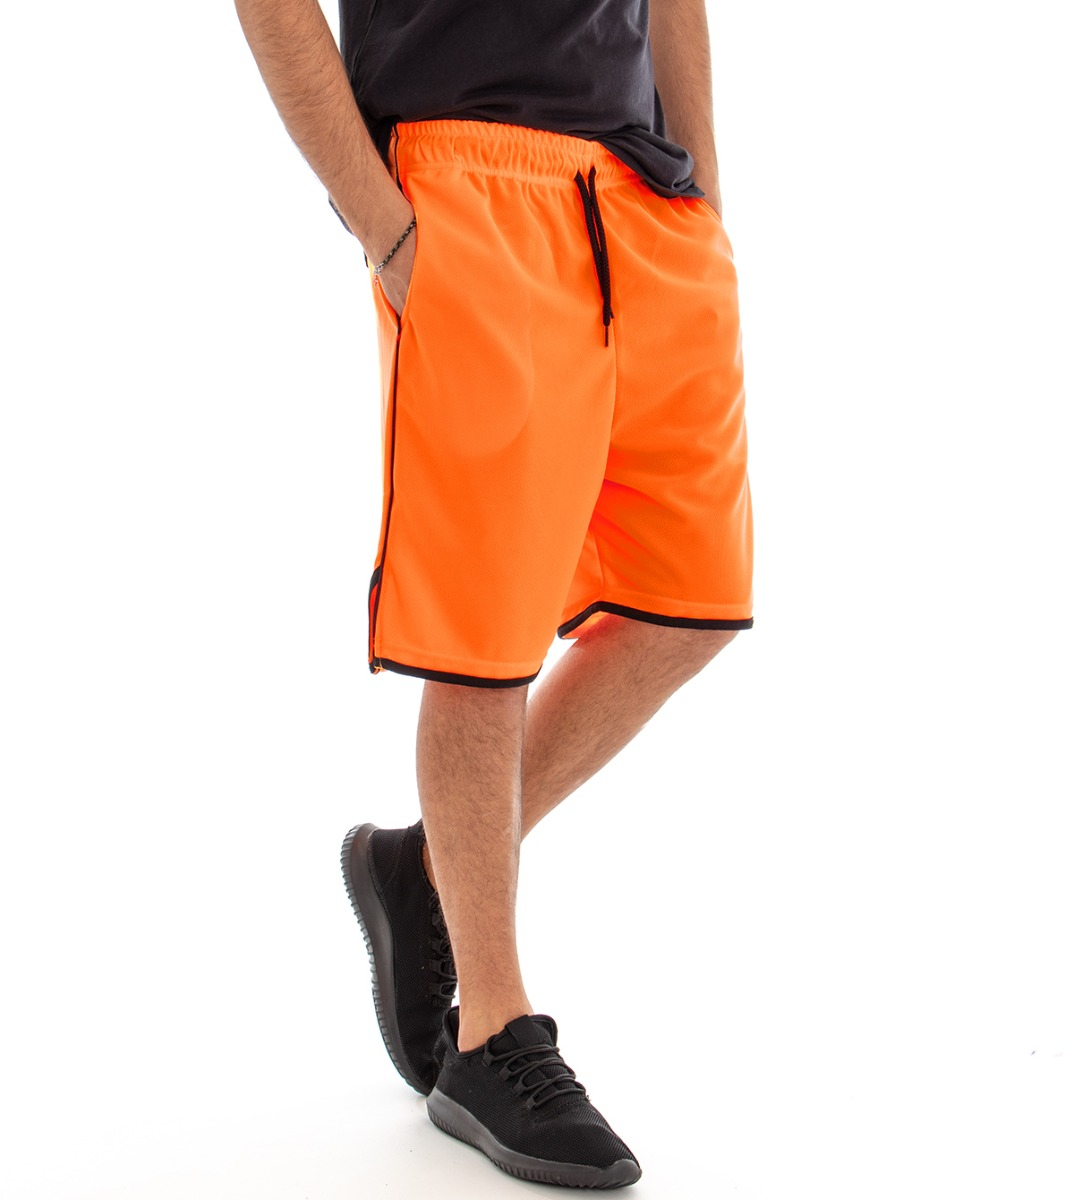 pantaloni adidas fluo